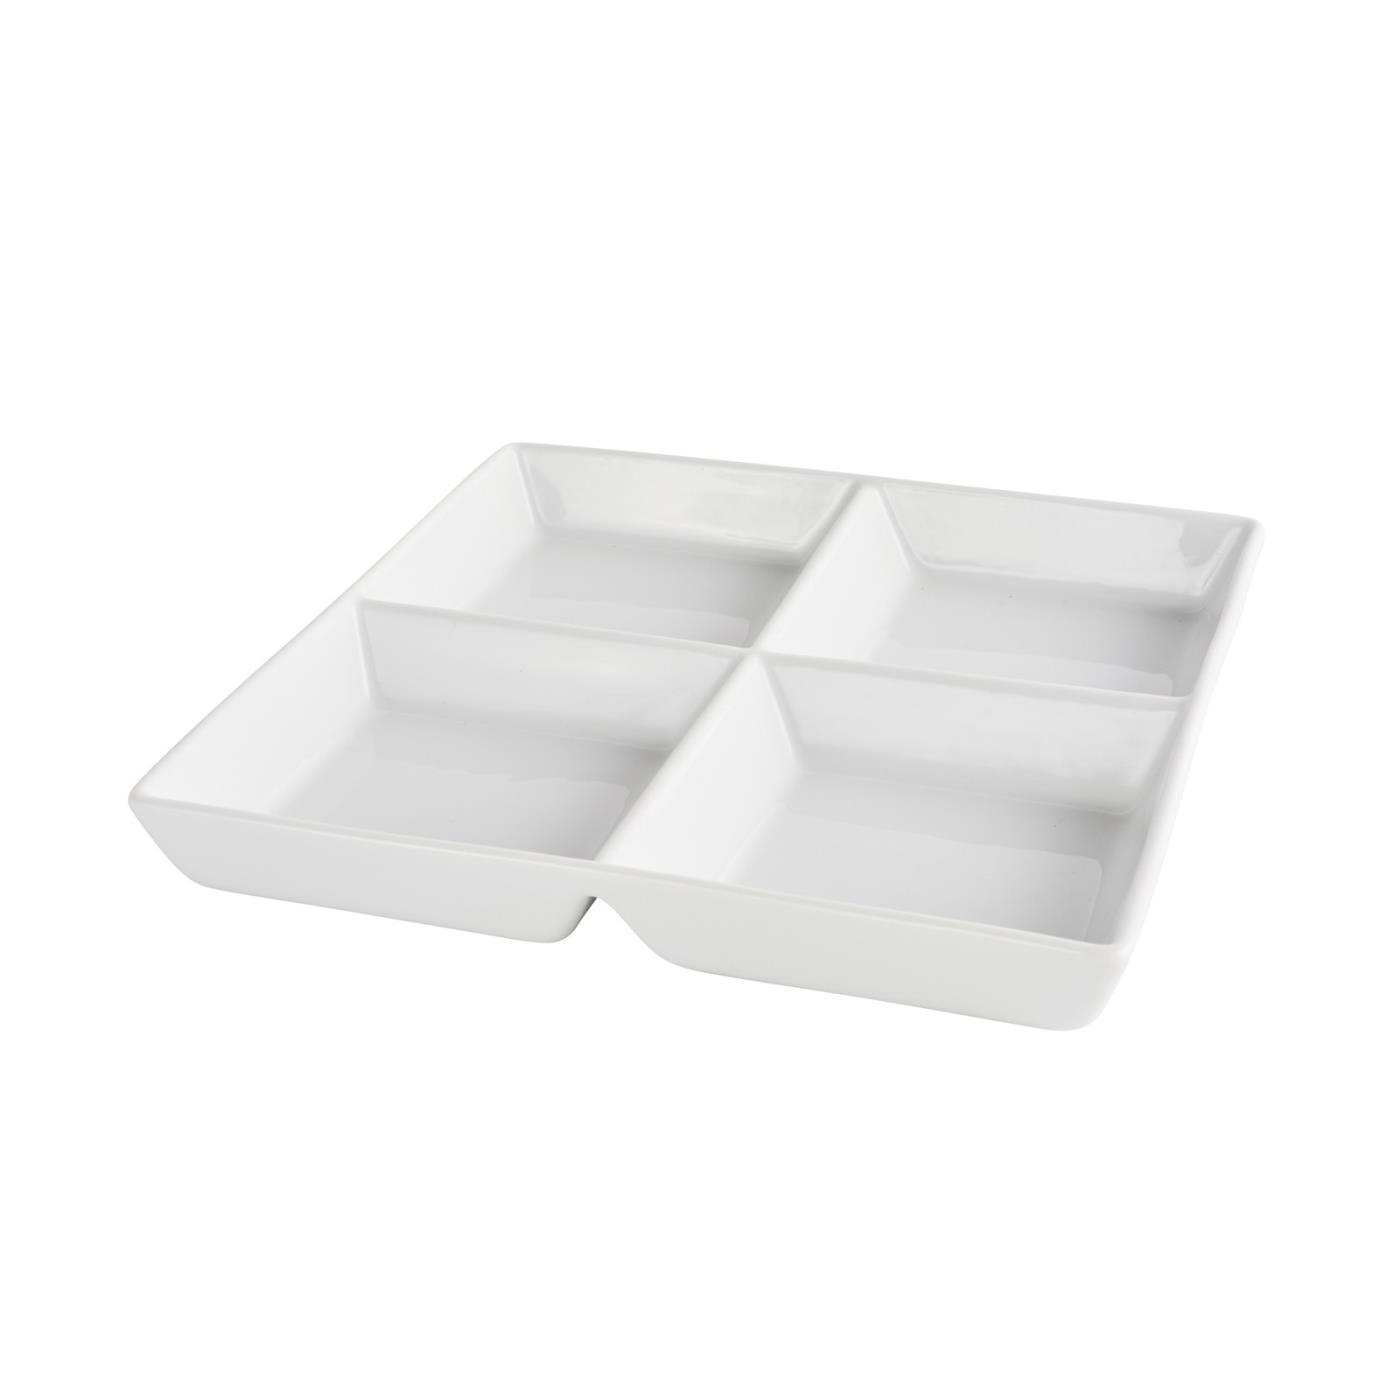 "Ceramic Square 4 Compartment Tasting Dish - 8"" With 4 Compartments"